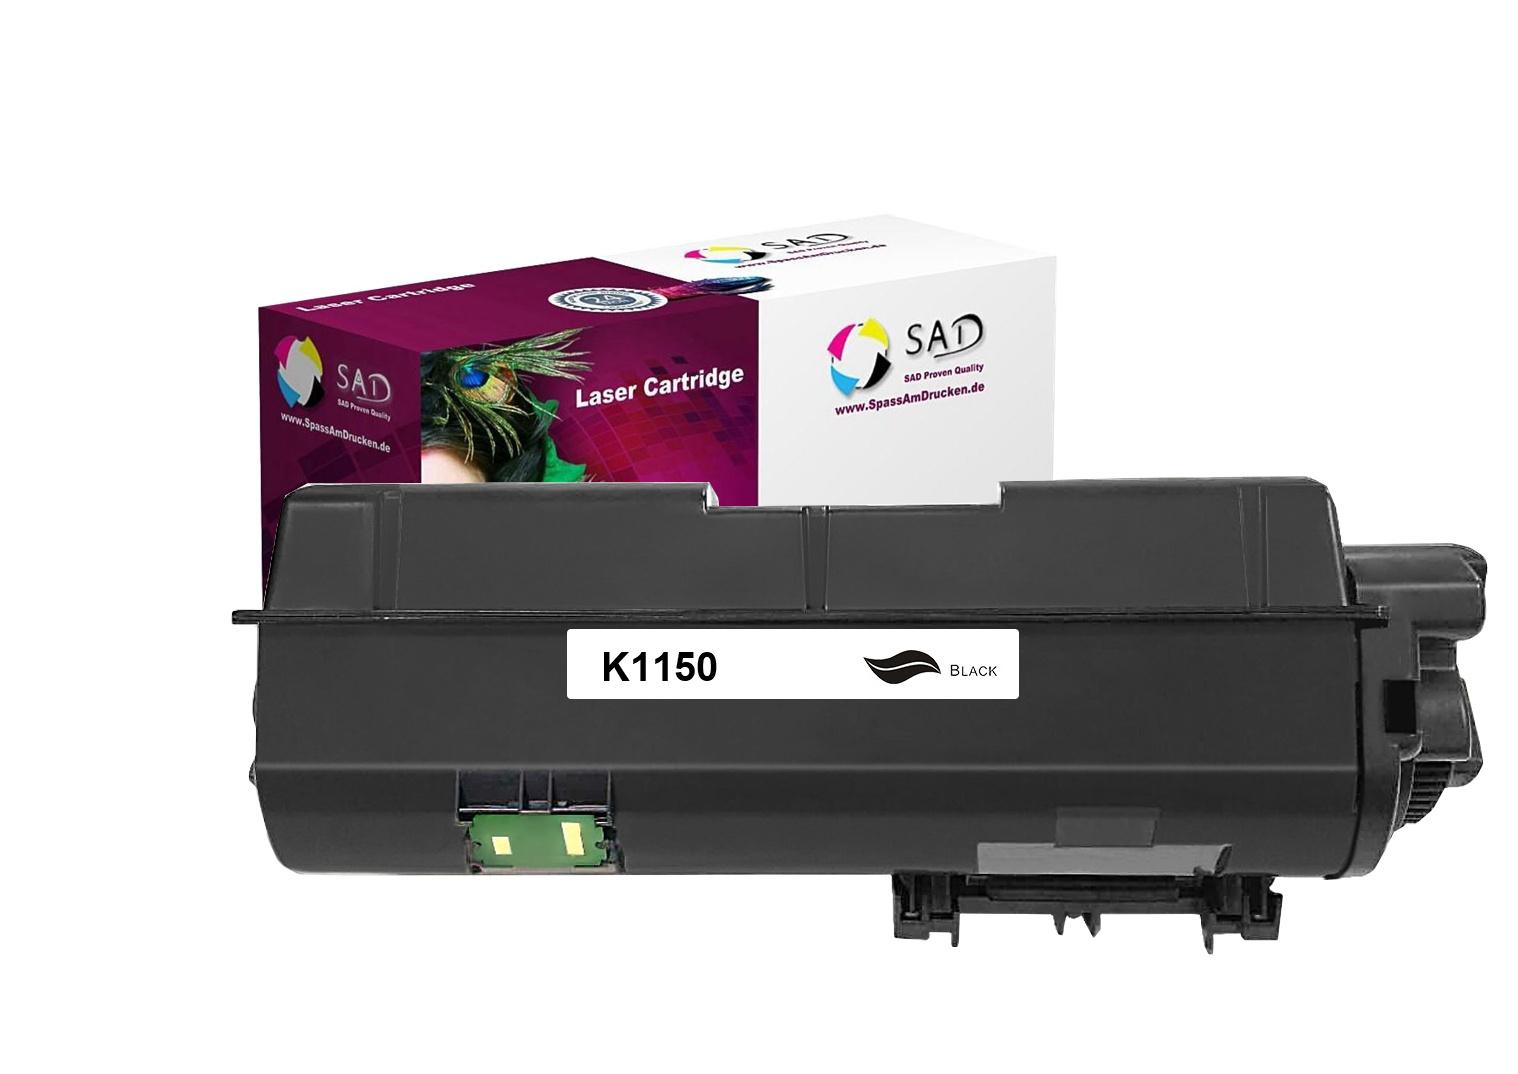 SAD Premium Toner kompatibel mit Kyocera TK-1150/ 1T02RT0NL0 Schwarz